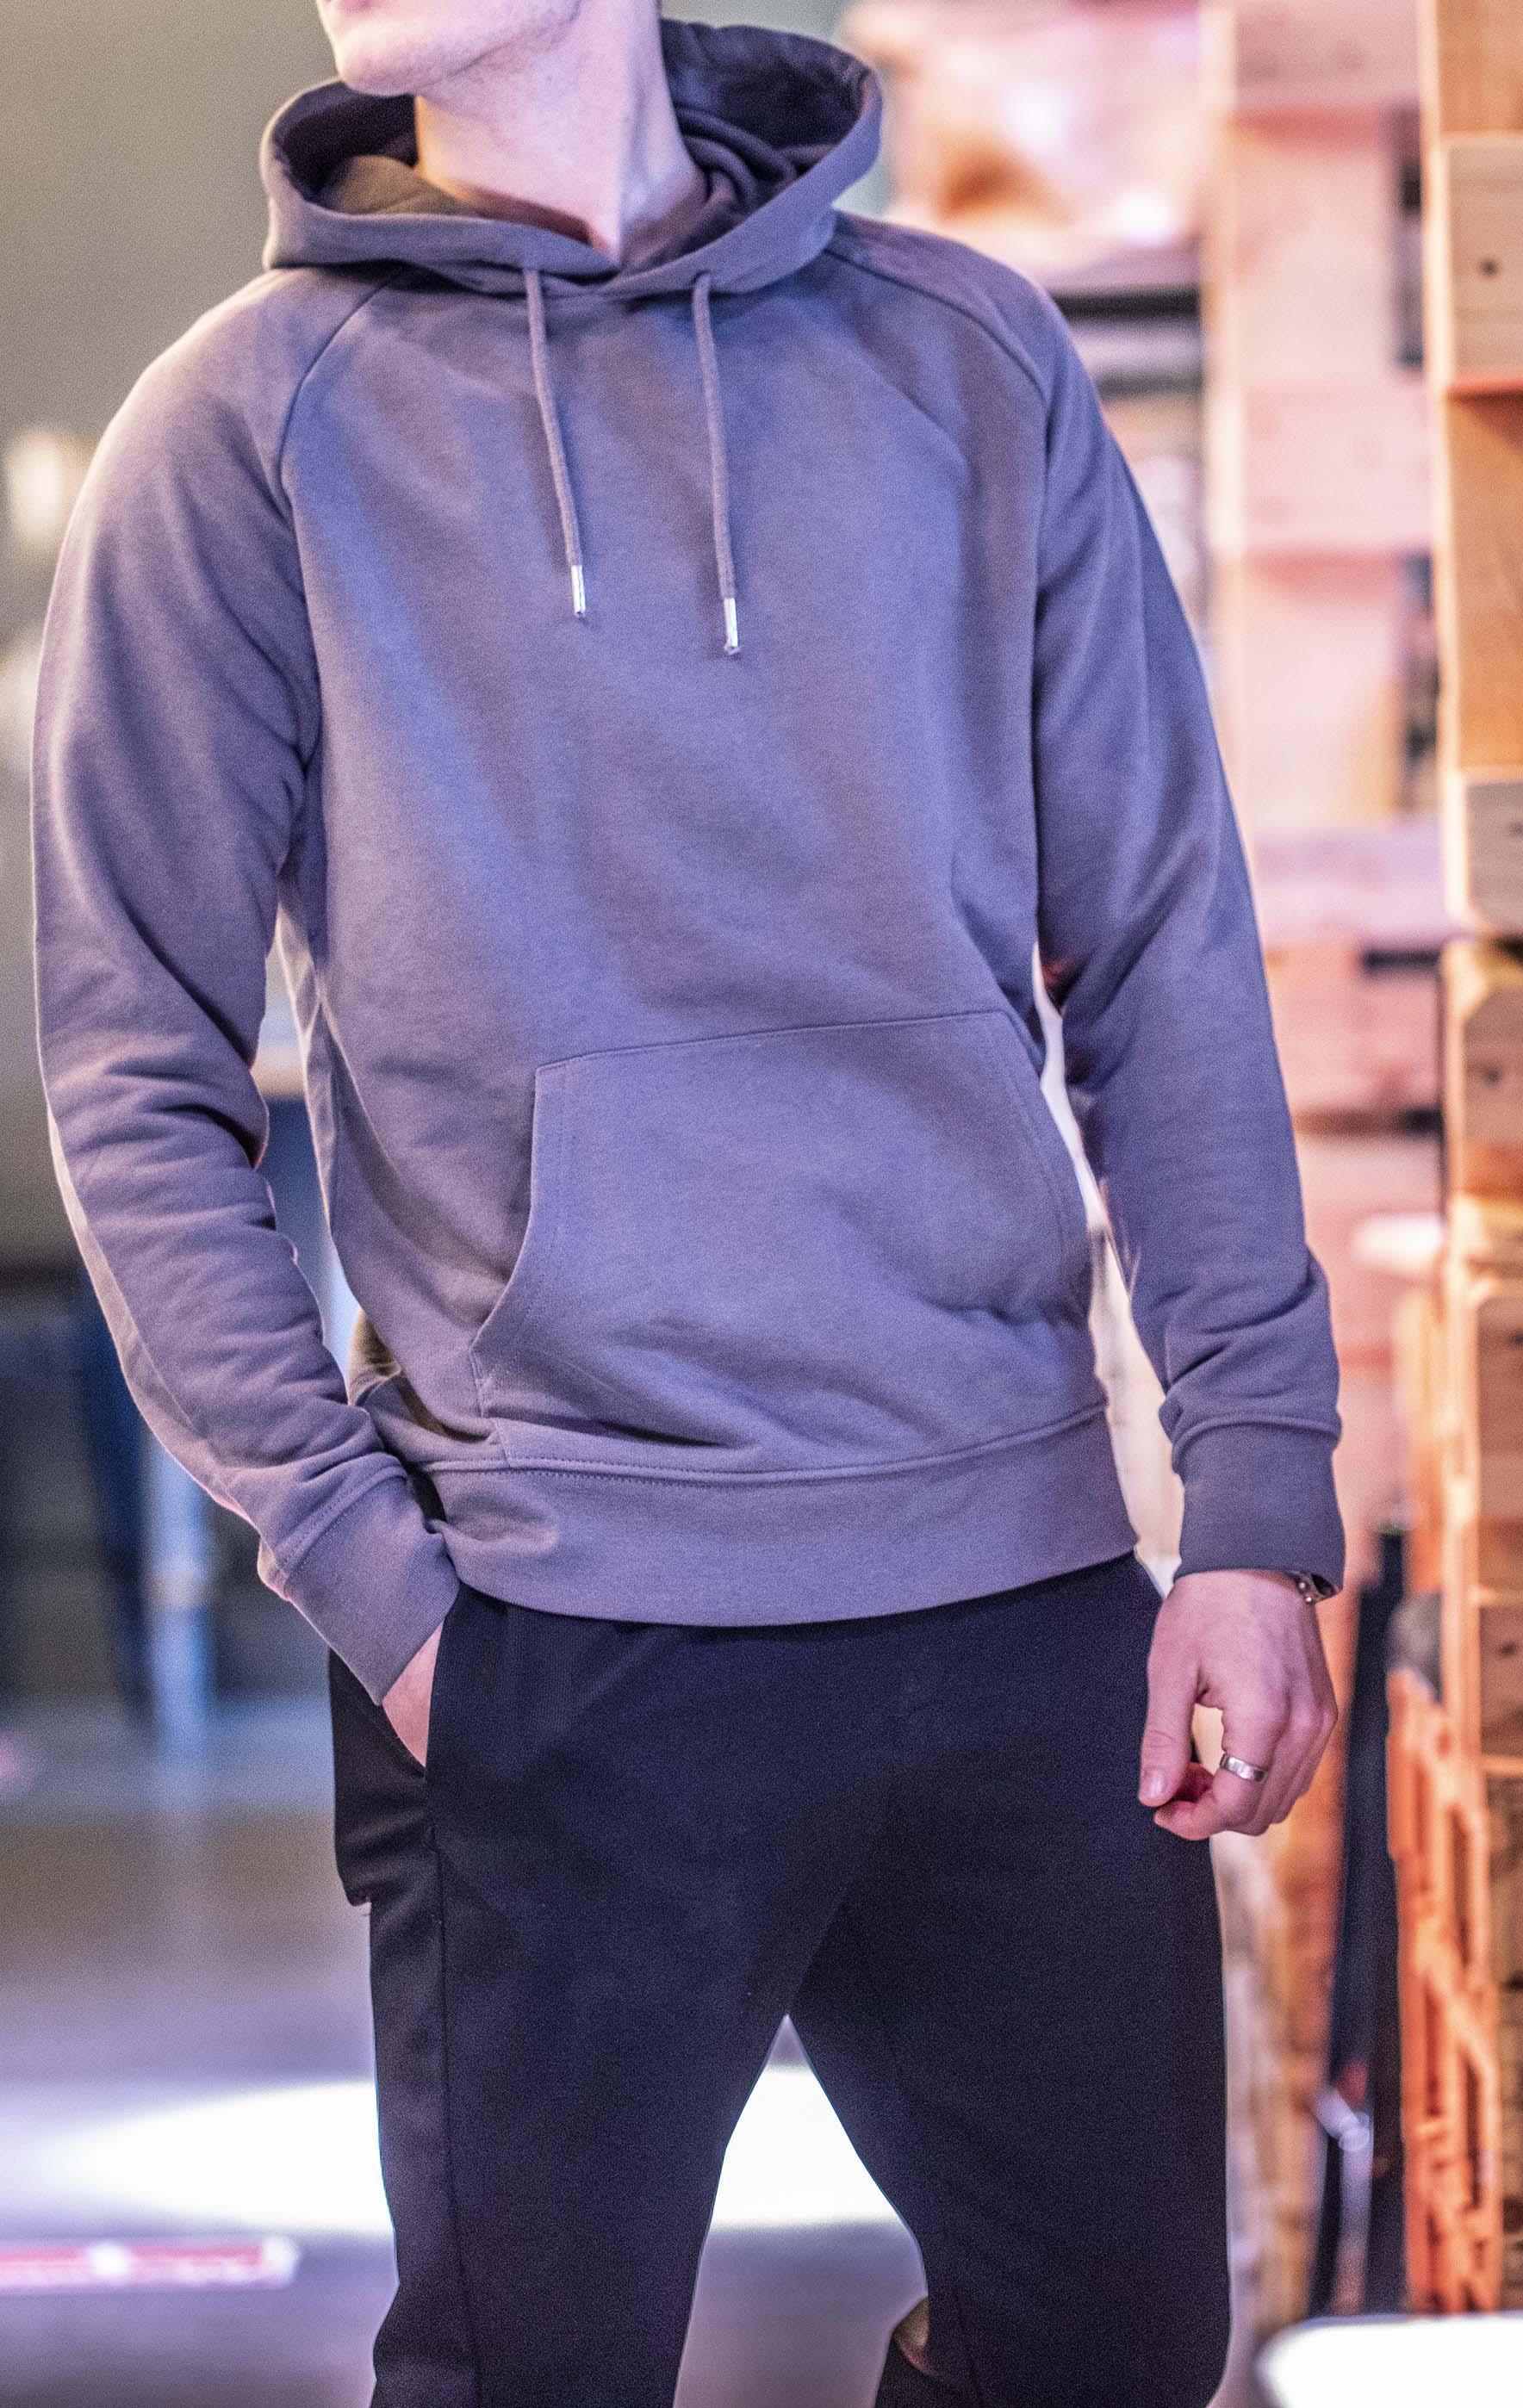 HOODIE ABERSFELDER Maß Männer - grau